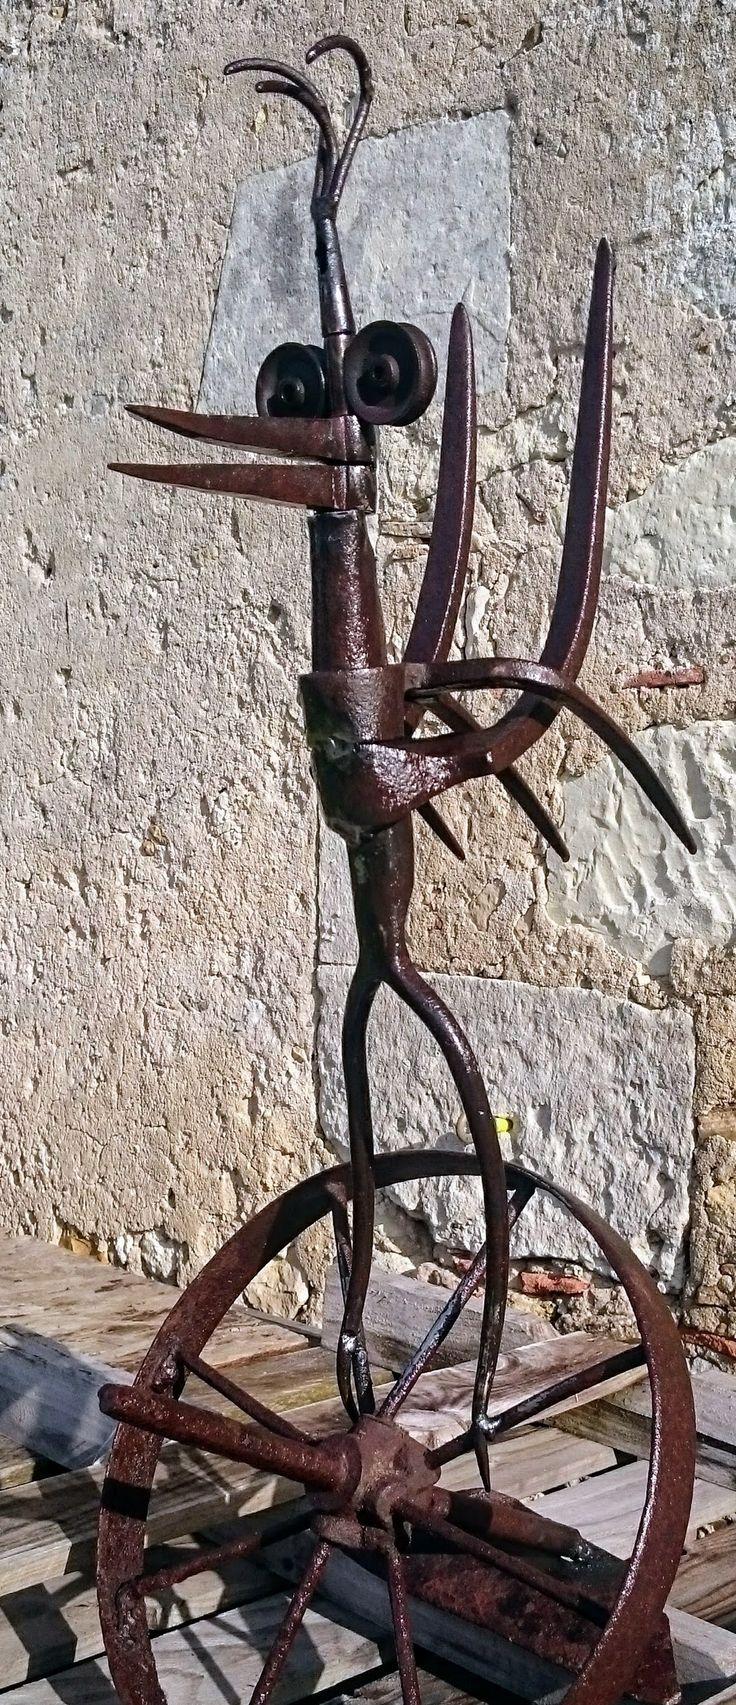 107 best metal images on pinterest abstract sculpture - Sculpture exterieure metal ...